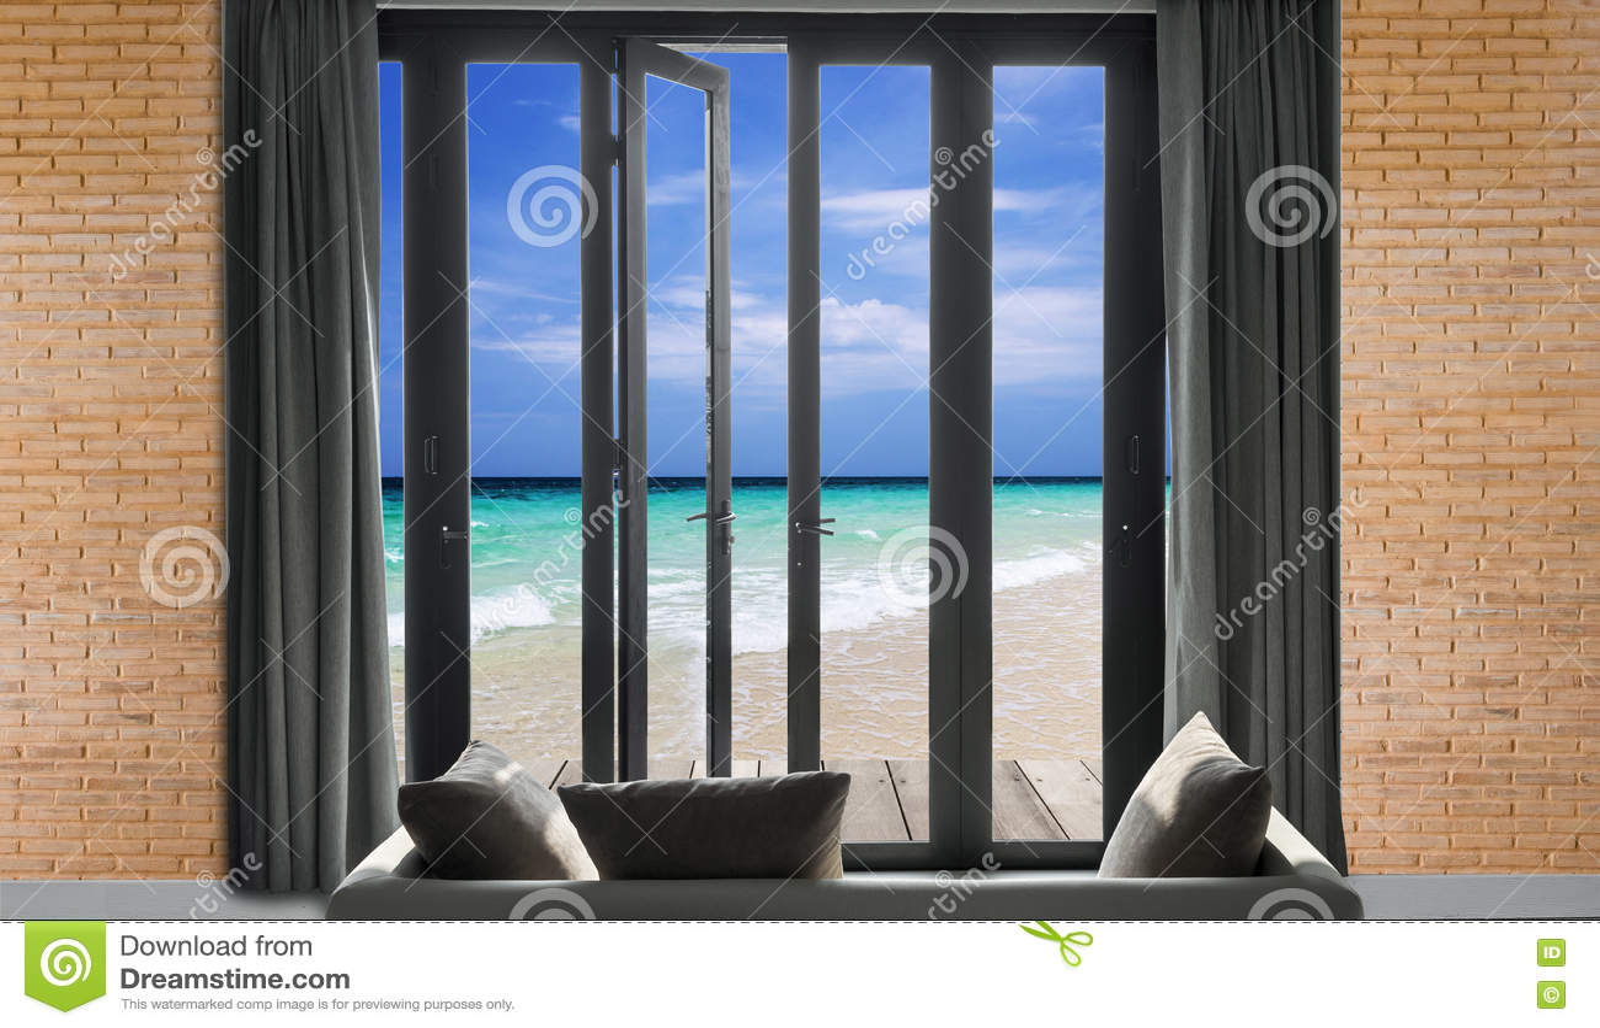 Seascape άποψης όμορφη τροπική παραλία και θάλασσα και ουρανός μπλε ουρανού,